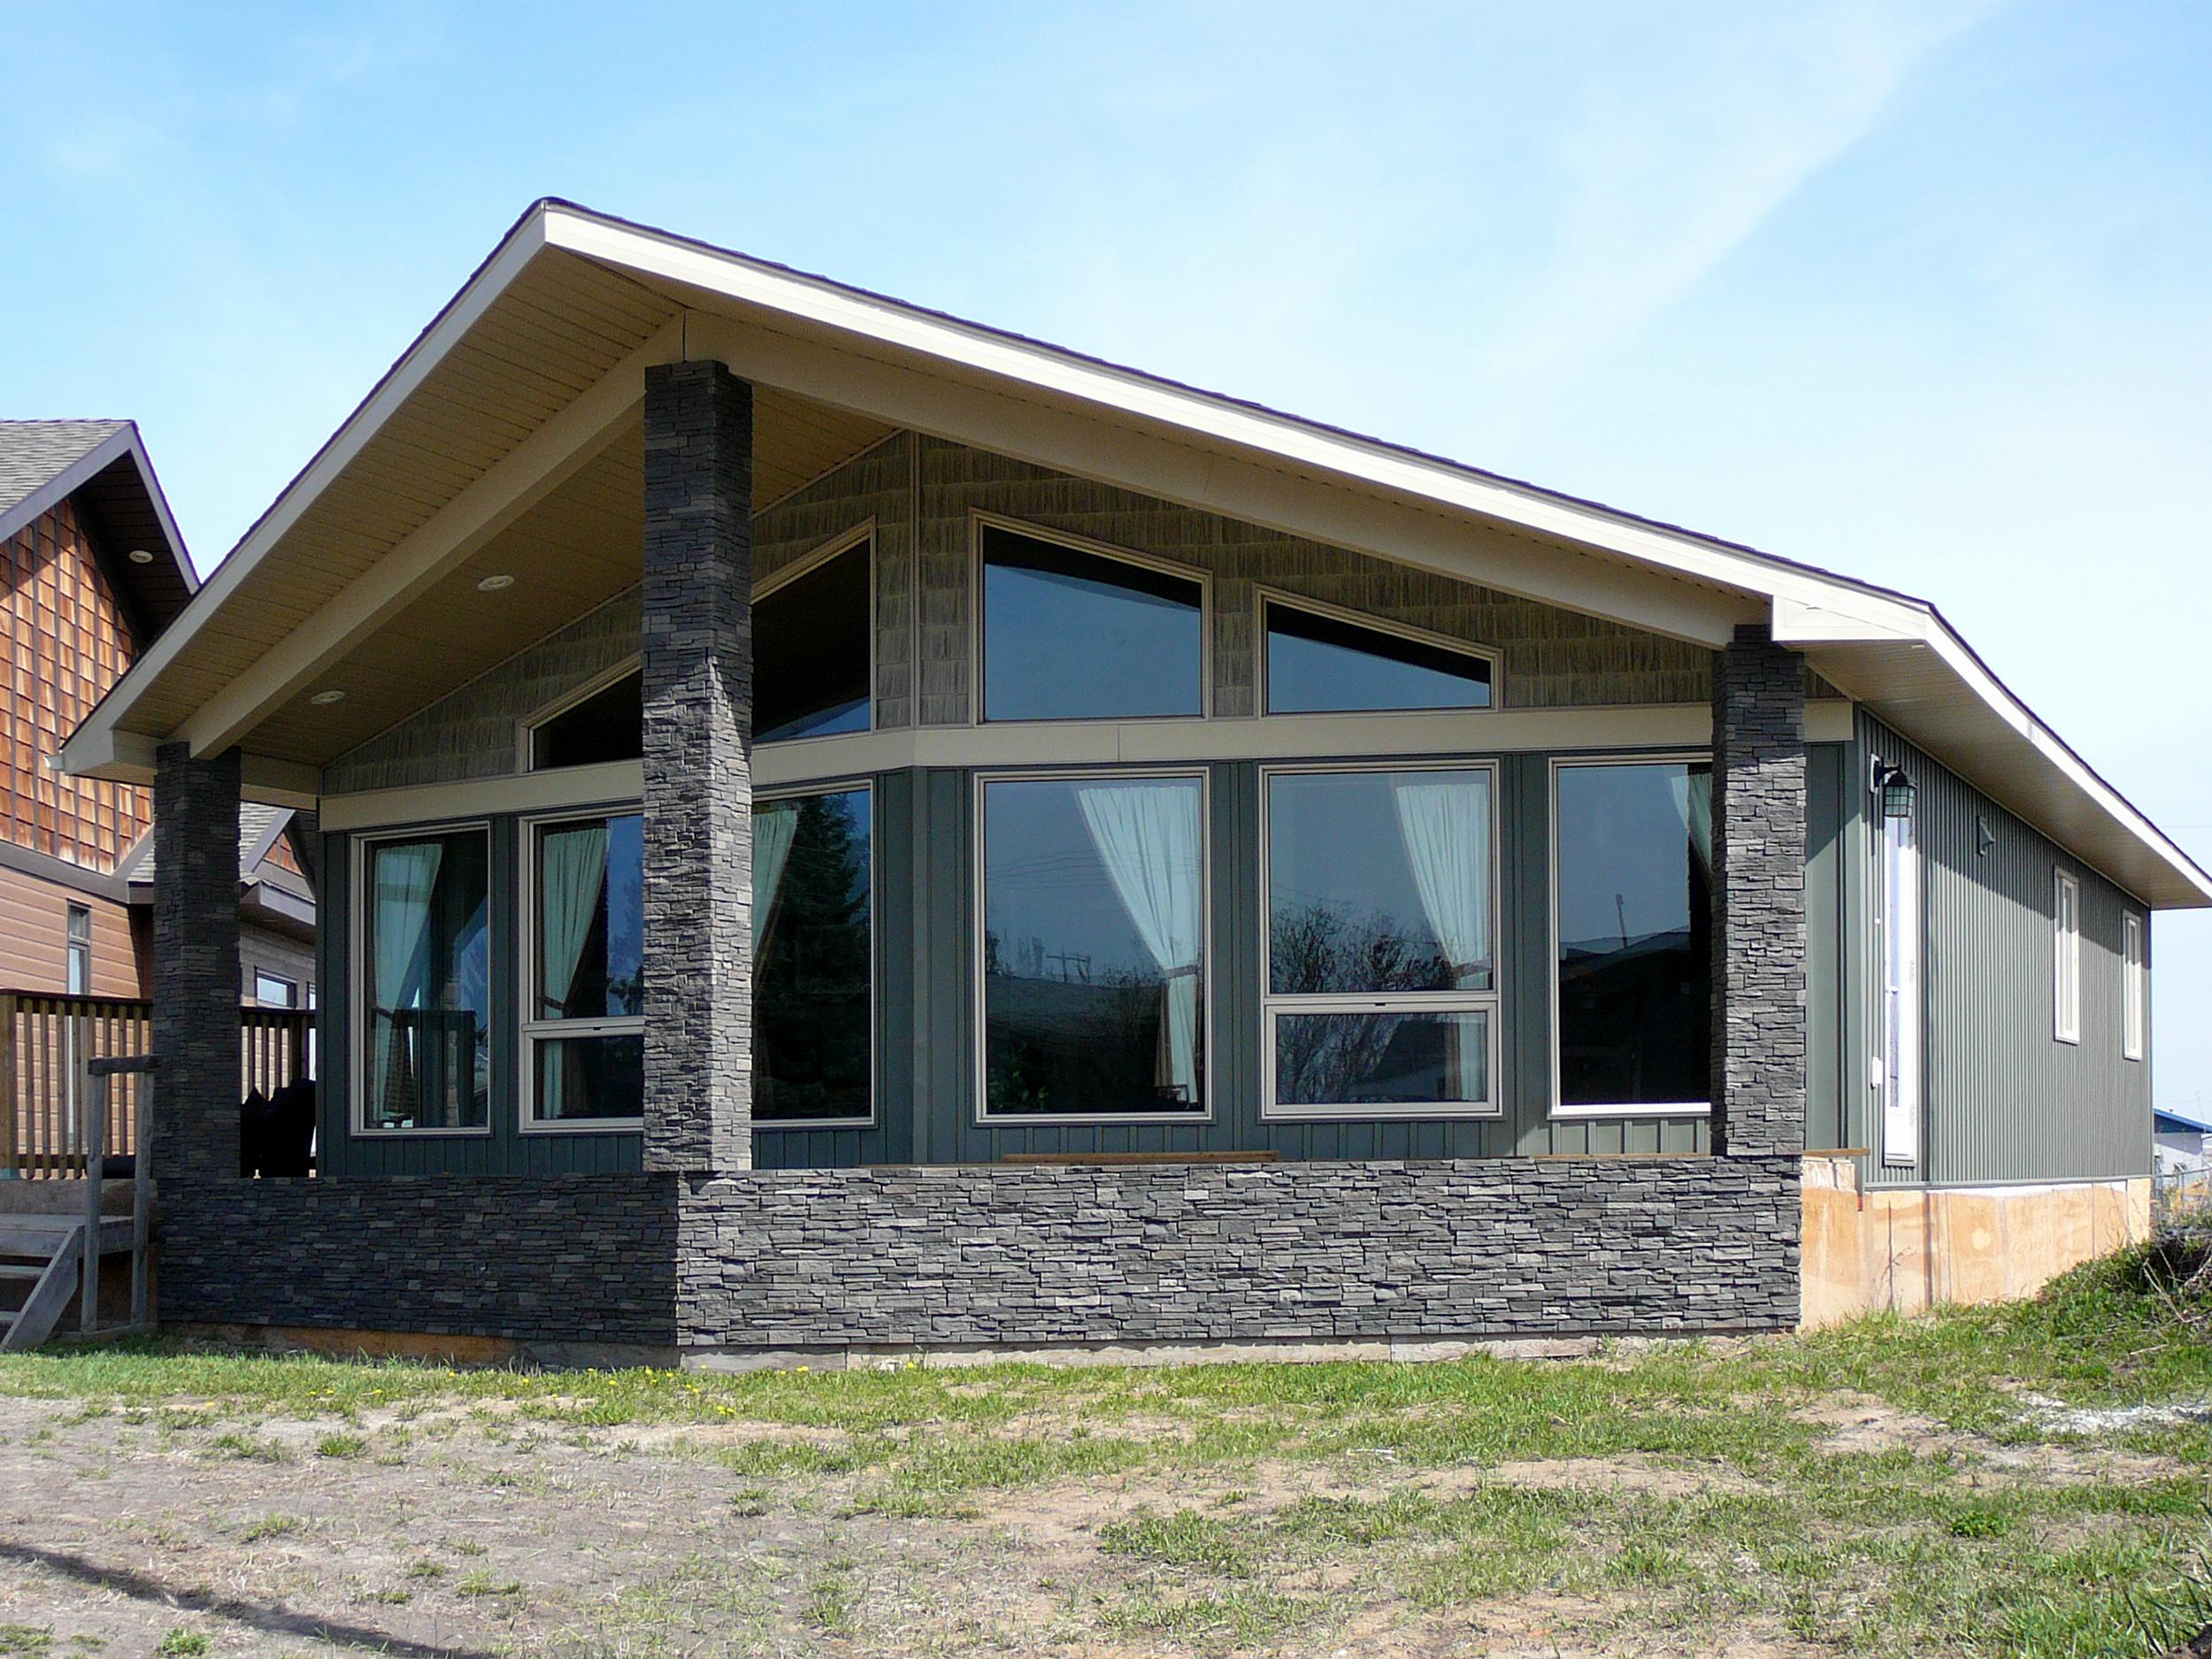 The Cliffside II. - 1,493 sq ftMore info >>>